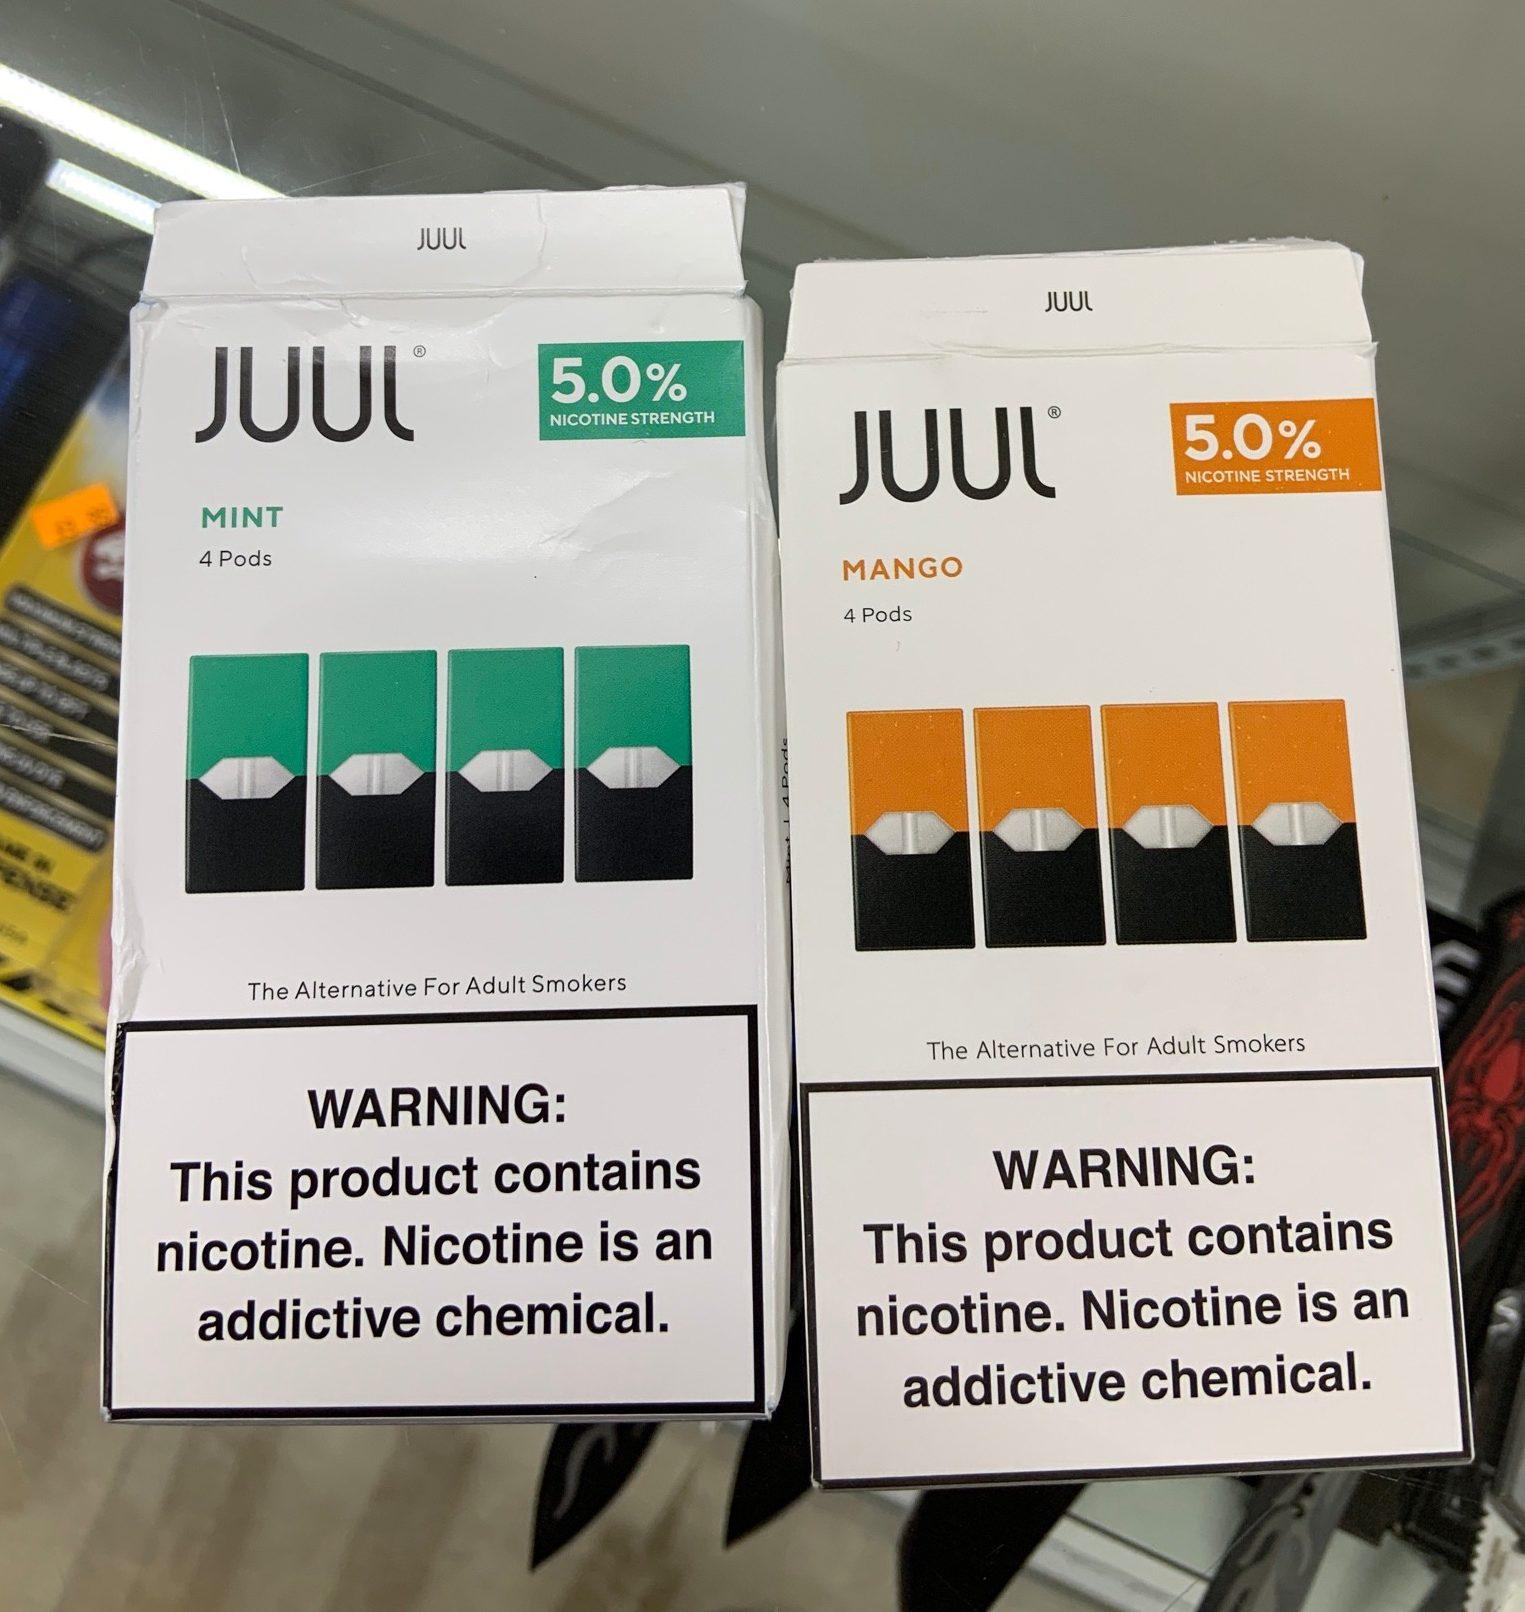 Fake pods (mango) vs real pods (mint)